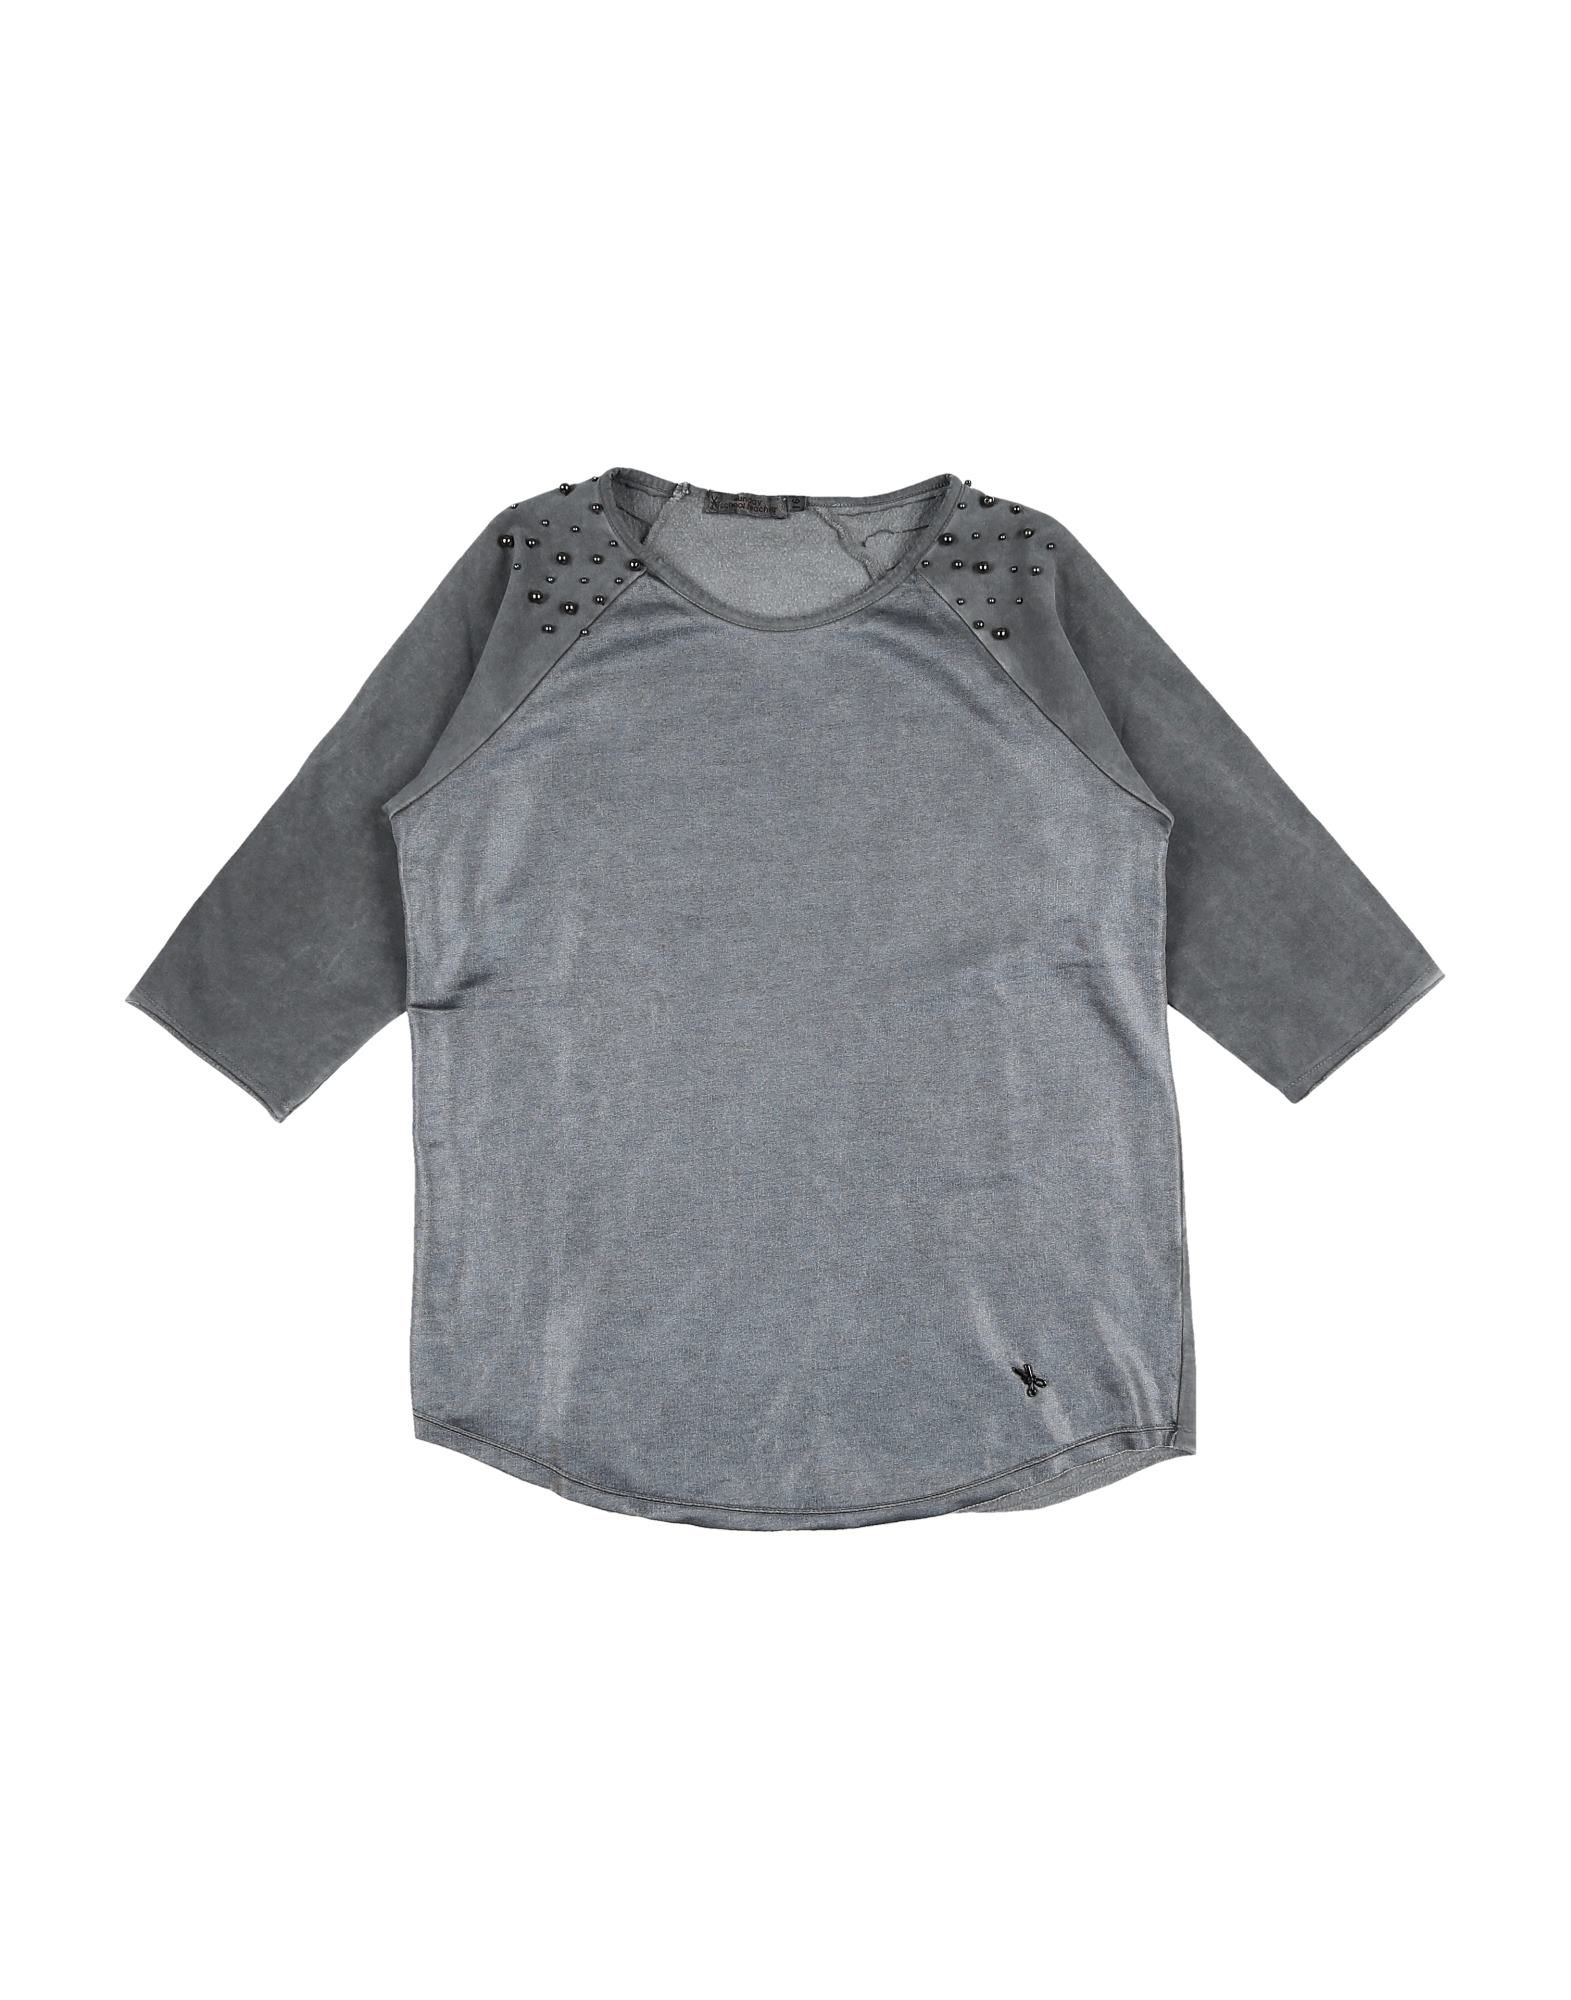 Sunday School Teacher Kids' Sweatshirts In Gray